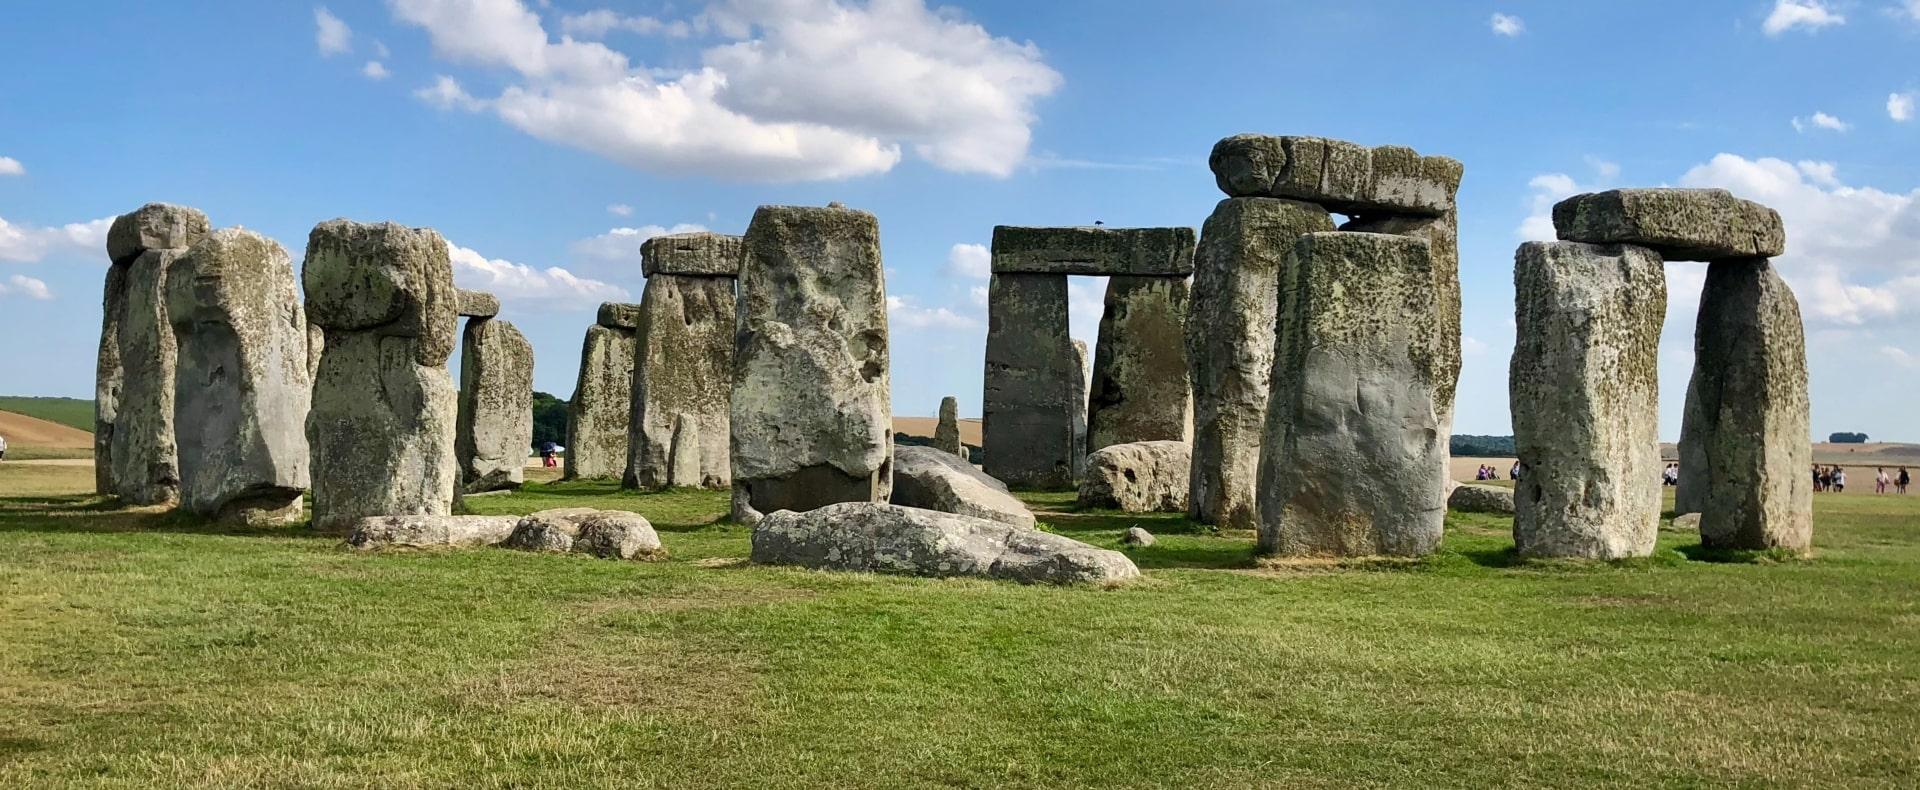 Stonehenge Experience Gallery